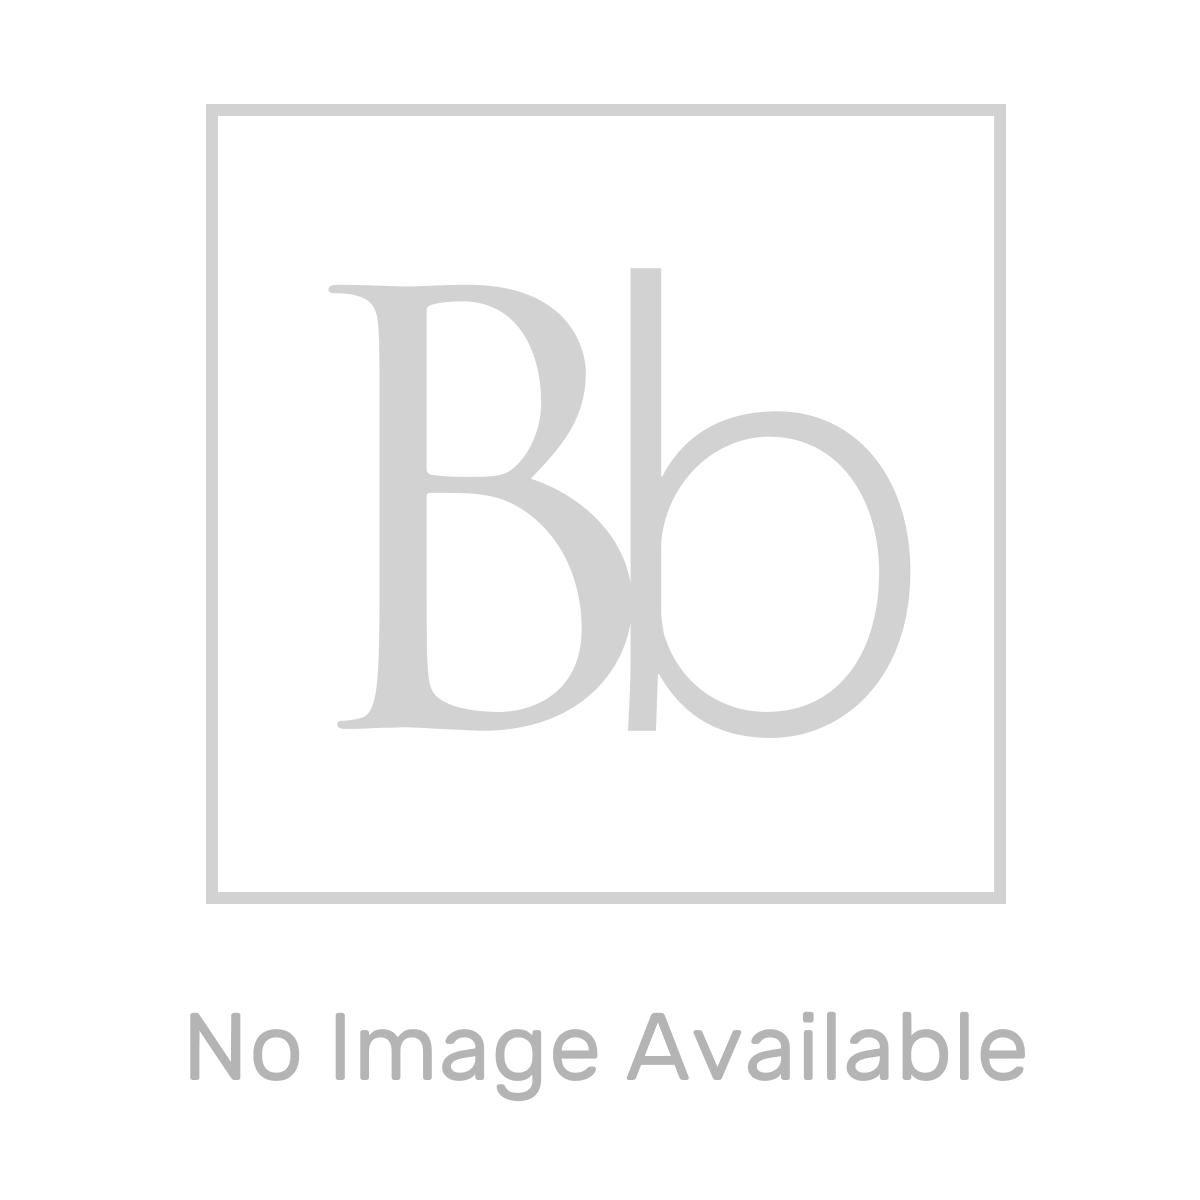 RAK Washington White Vanity Unit with Black Countertop 1200mm Measurements